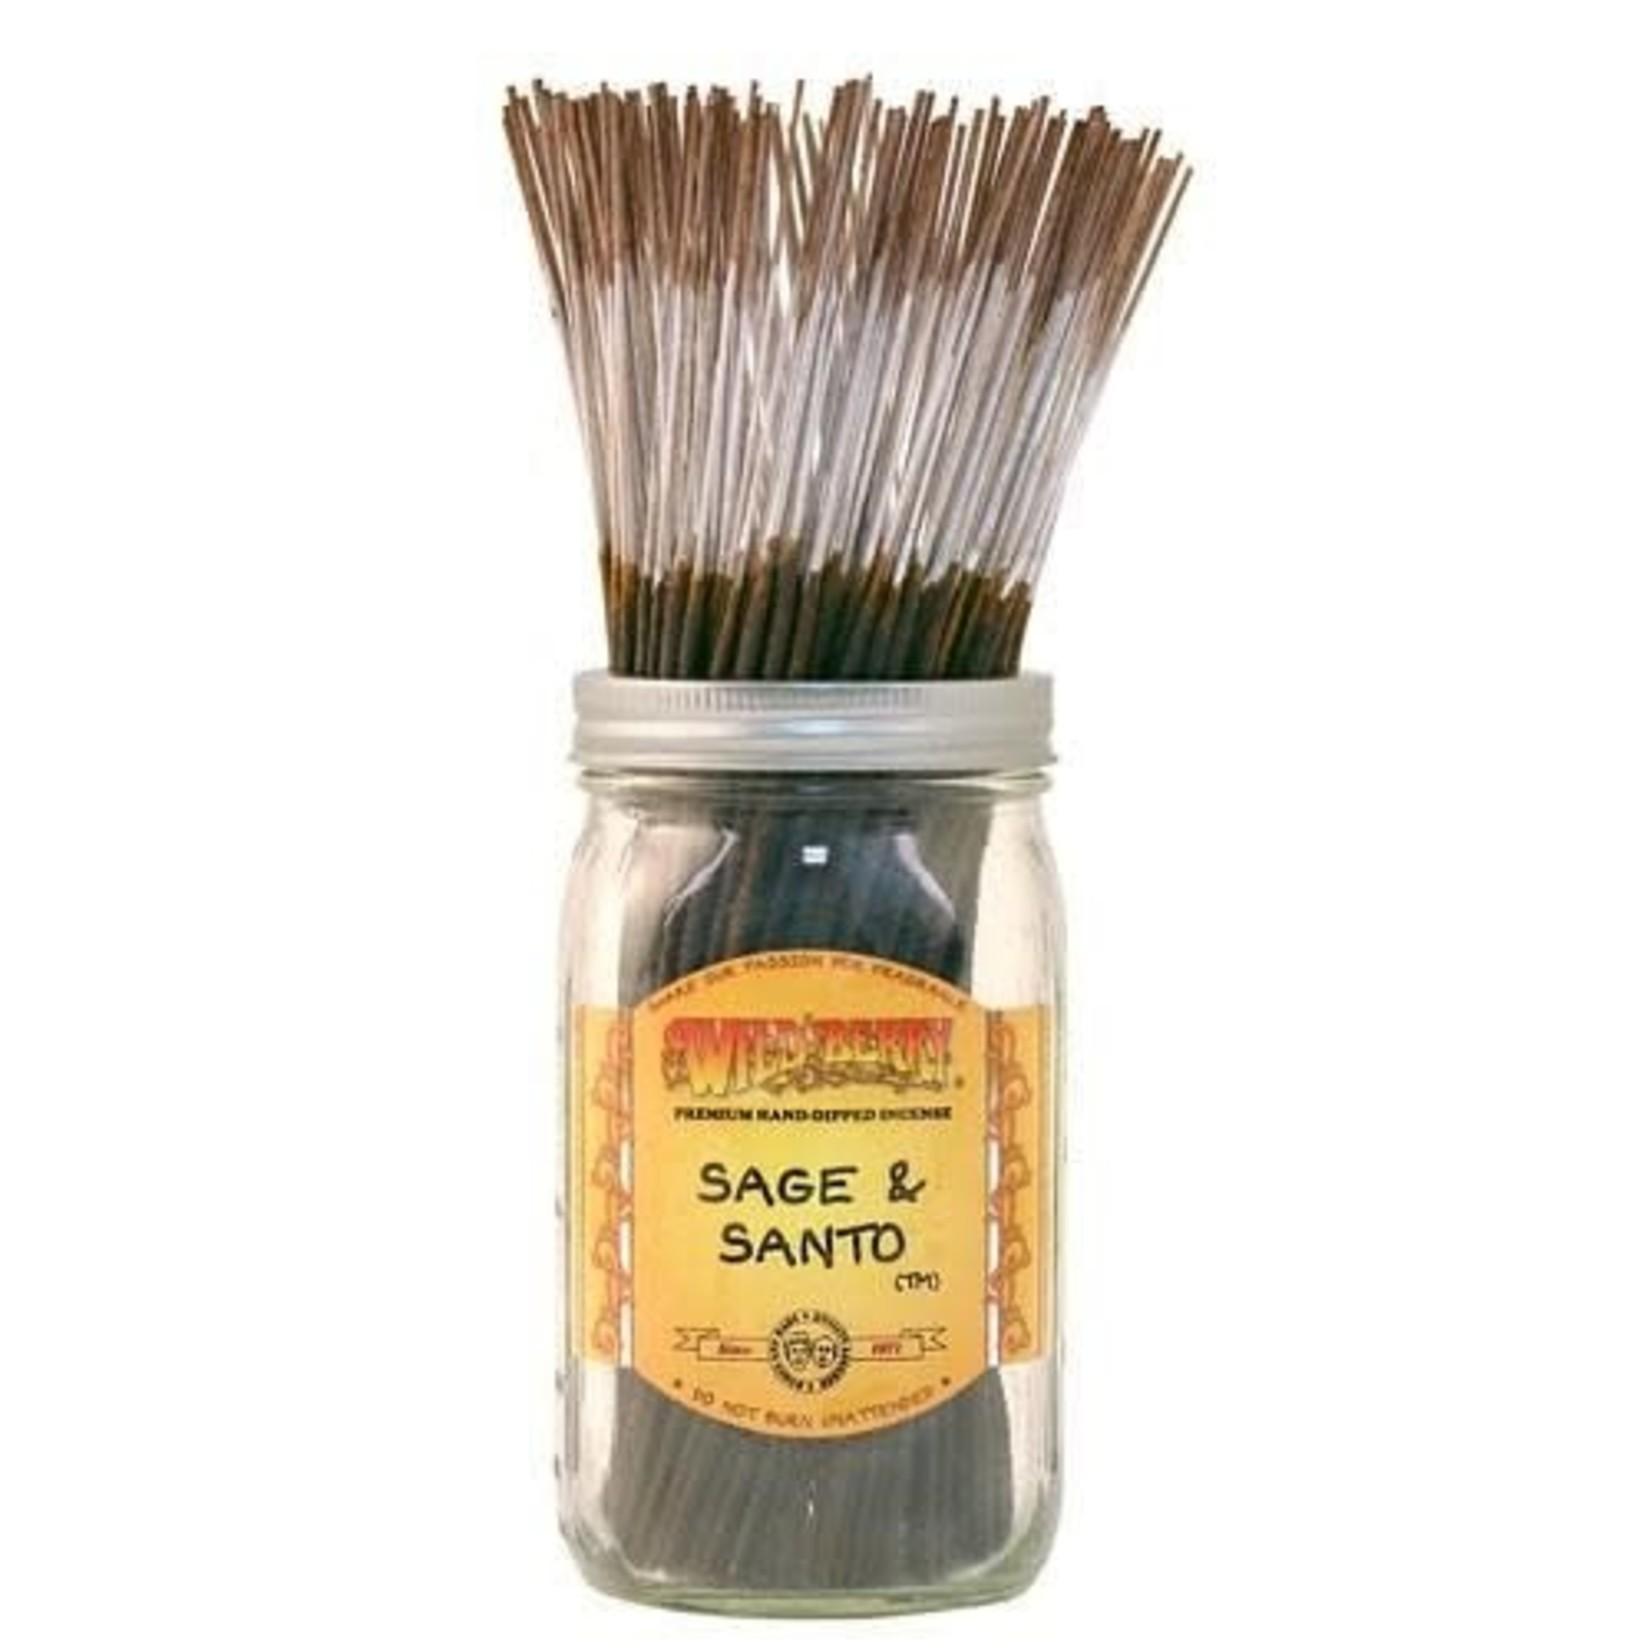 Sage & Santo Incense - Wild Berry